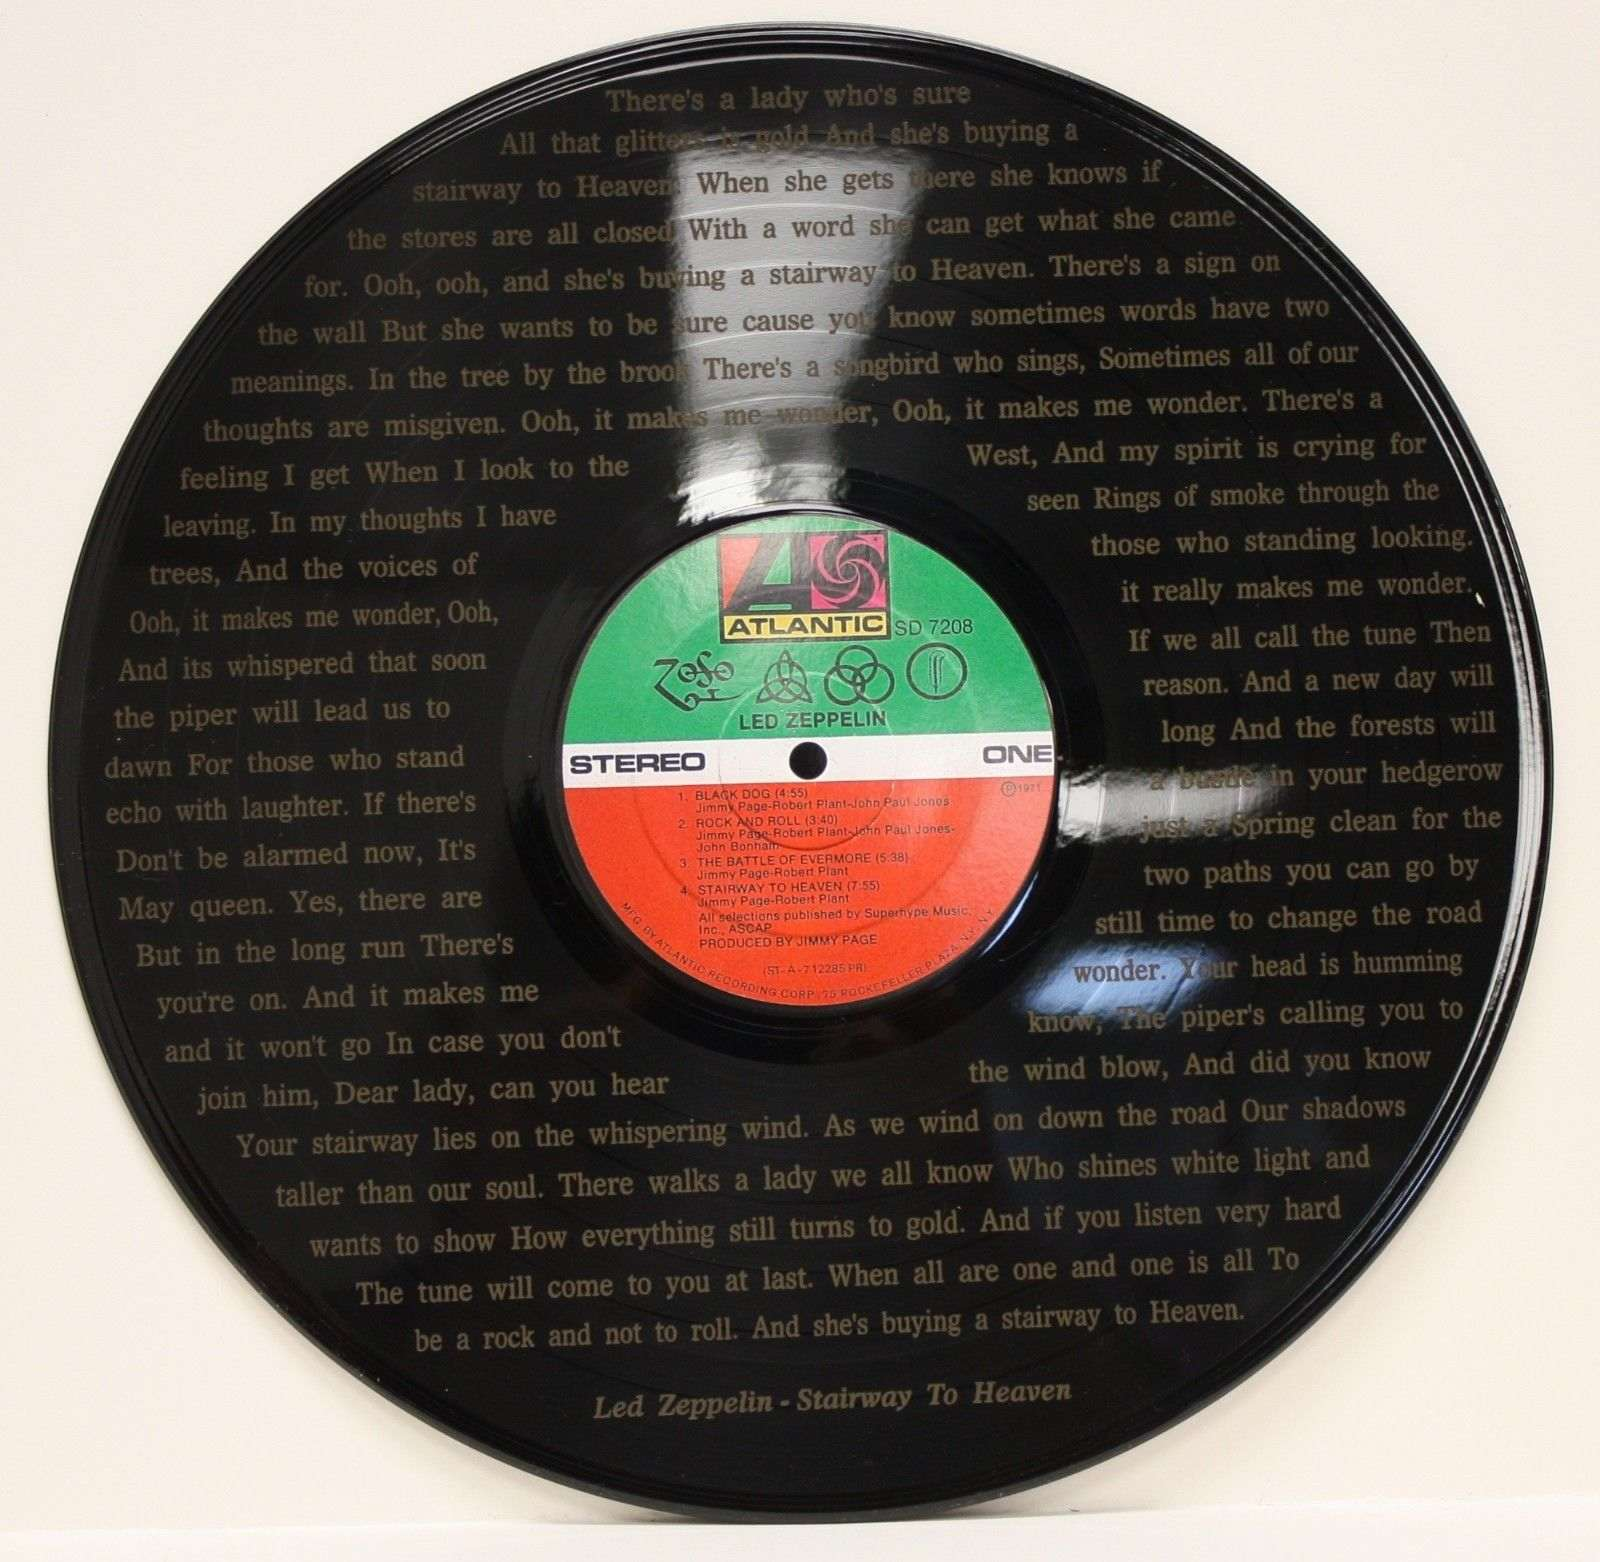 Led Zeppelin Vinyl Lp Etched W Stairway To Heaven Lyrics